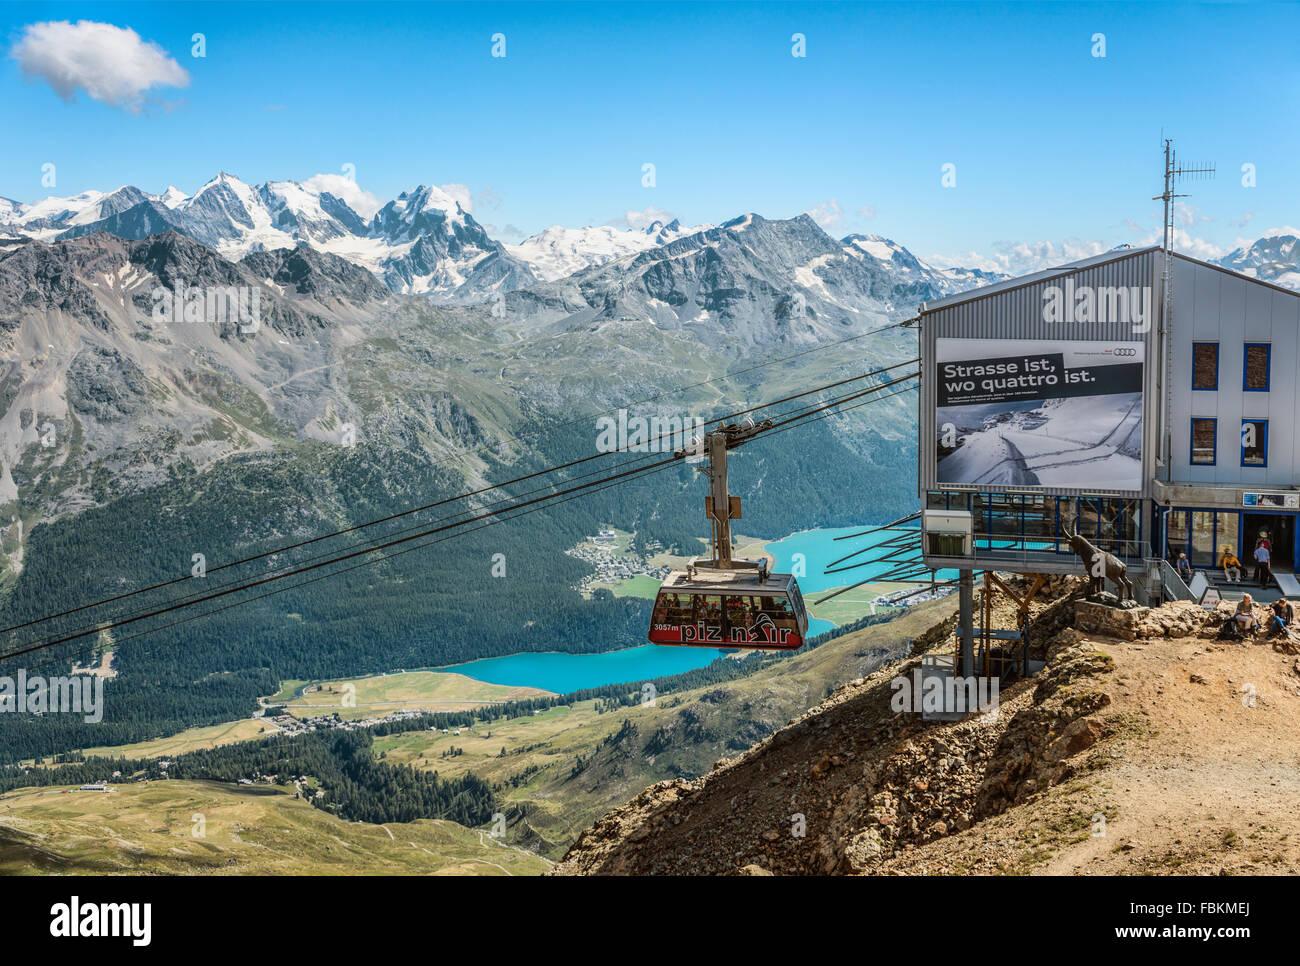 Il Piz Nair funicolare, St.Moritz, Grigioni, Svizzera | Piz Nair Seilbahn, St.Moritz, Schweiz Immagini Stock